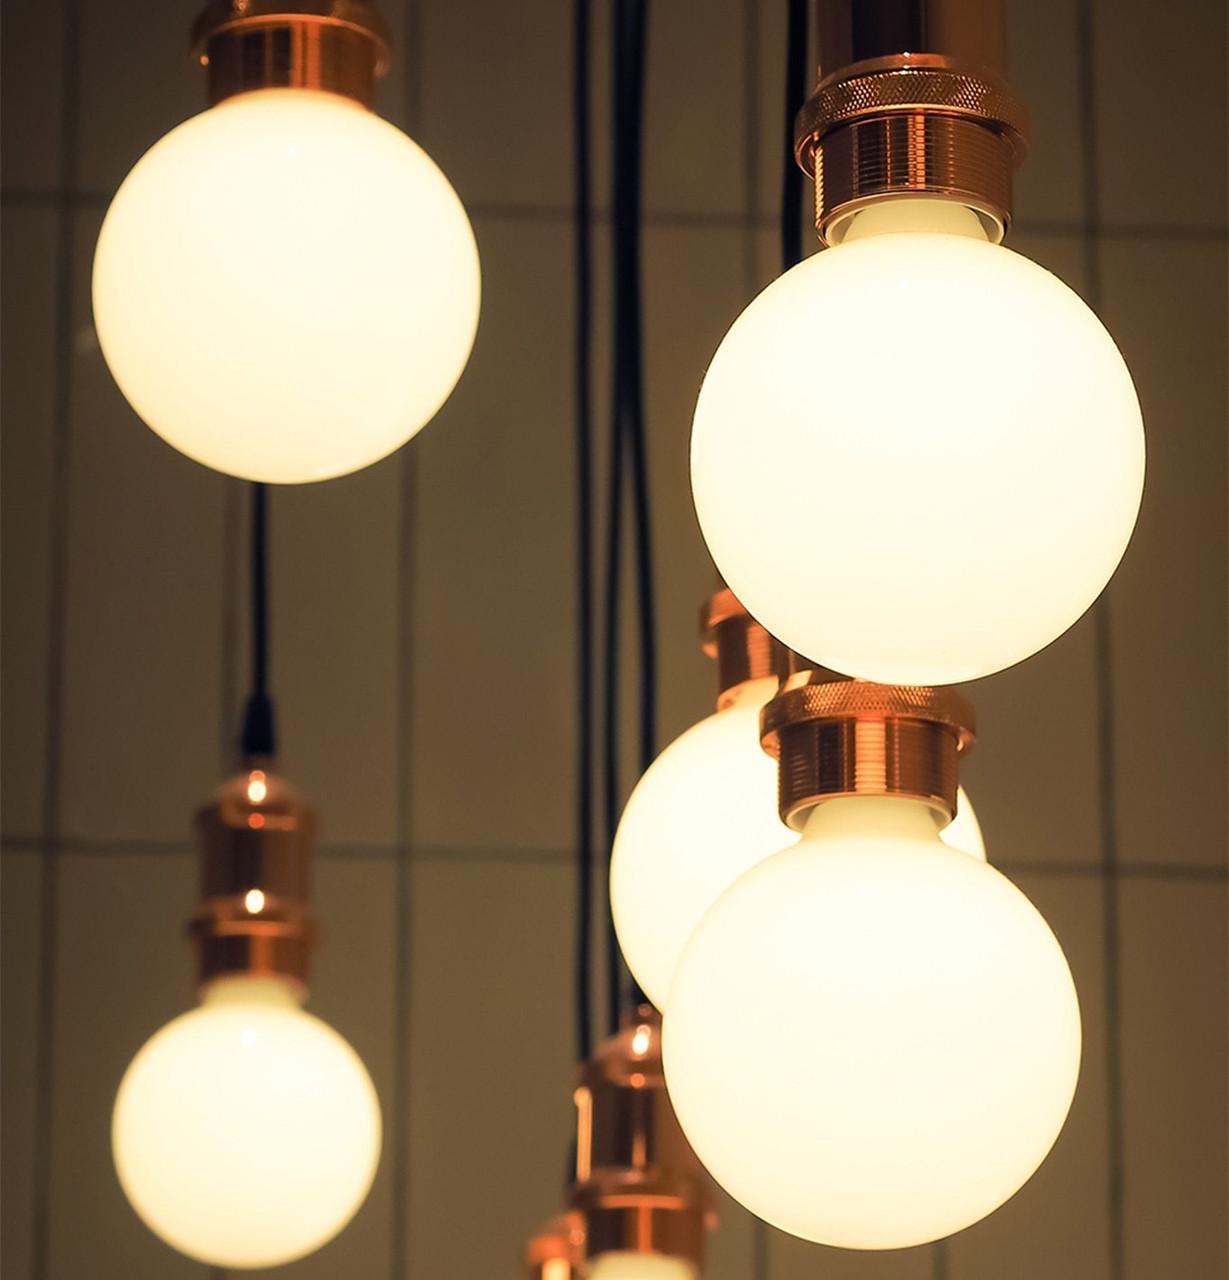 LED Dimmable G125 BC Light Bulbs